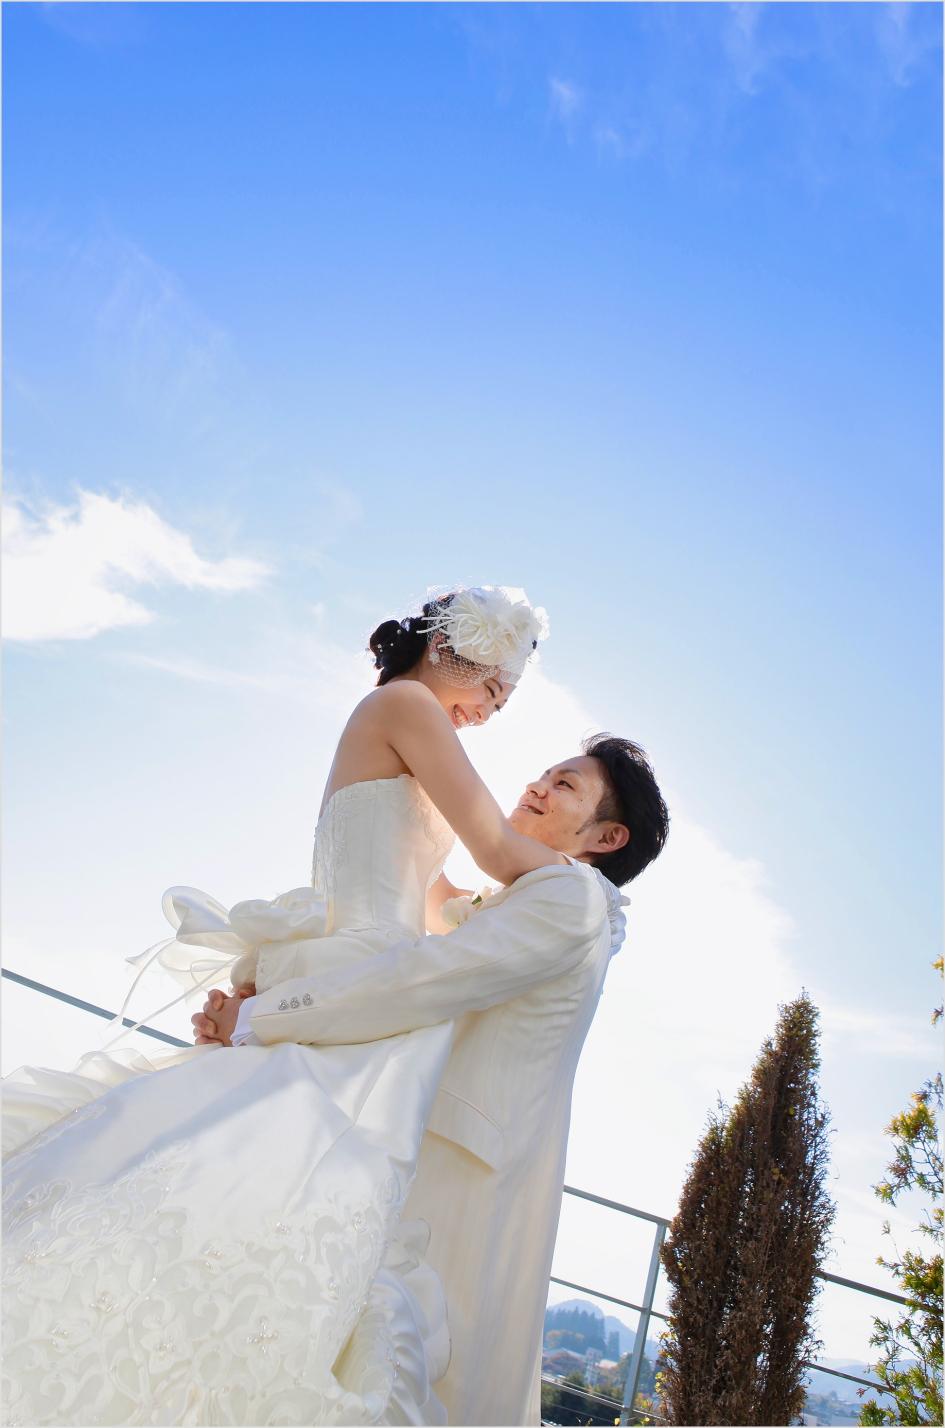 ご成約特典「令和元年=結婚元年」